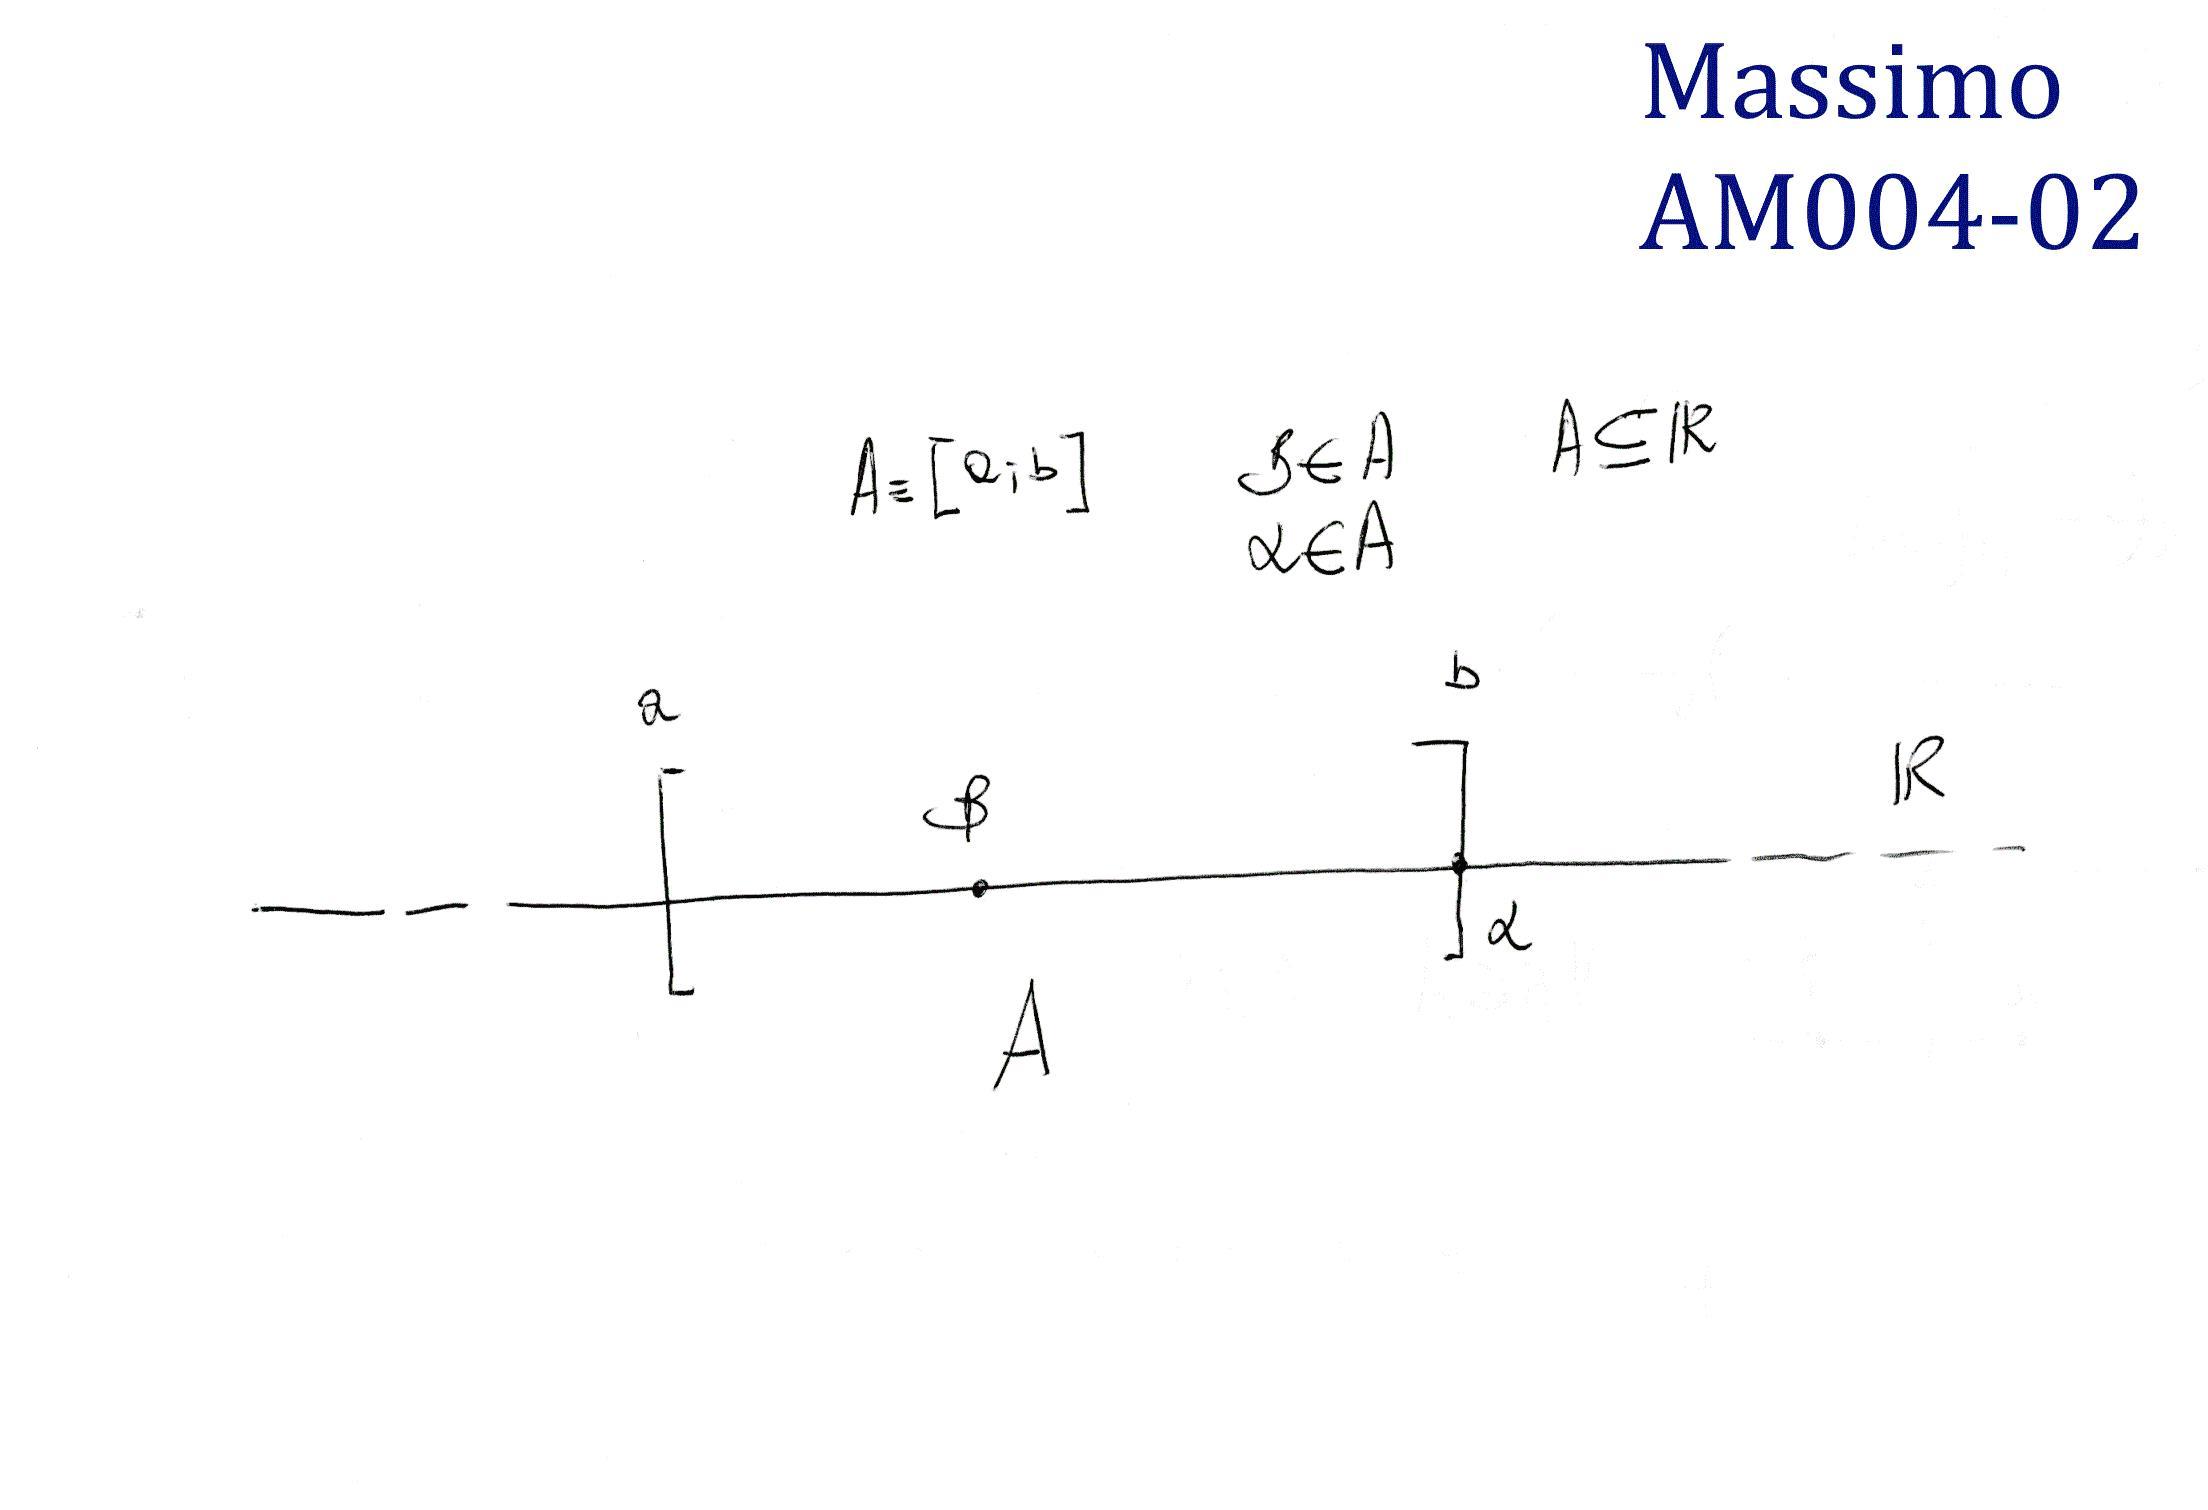 Analisi Matematica - Massimo - AM004-02